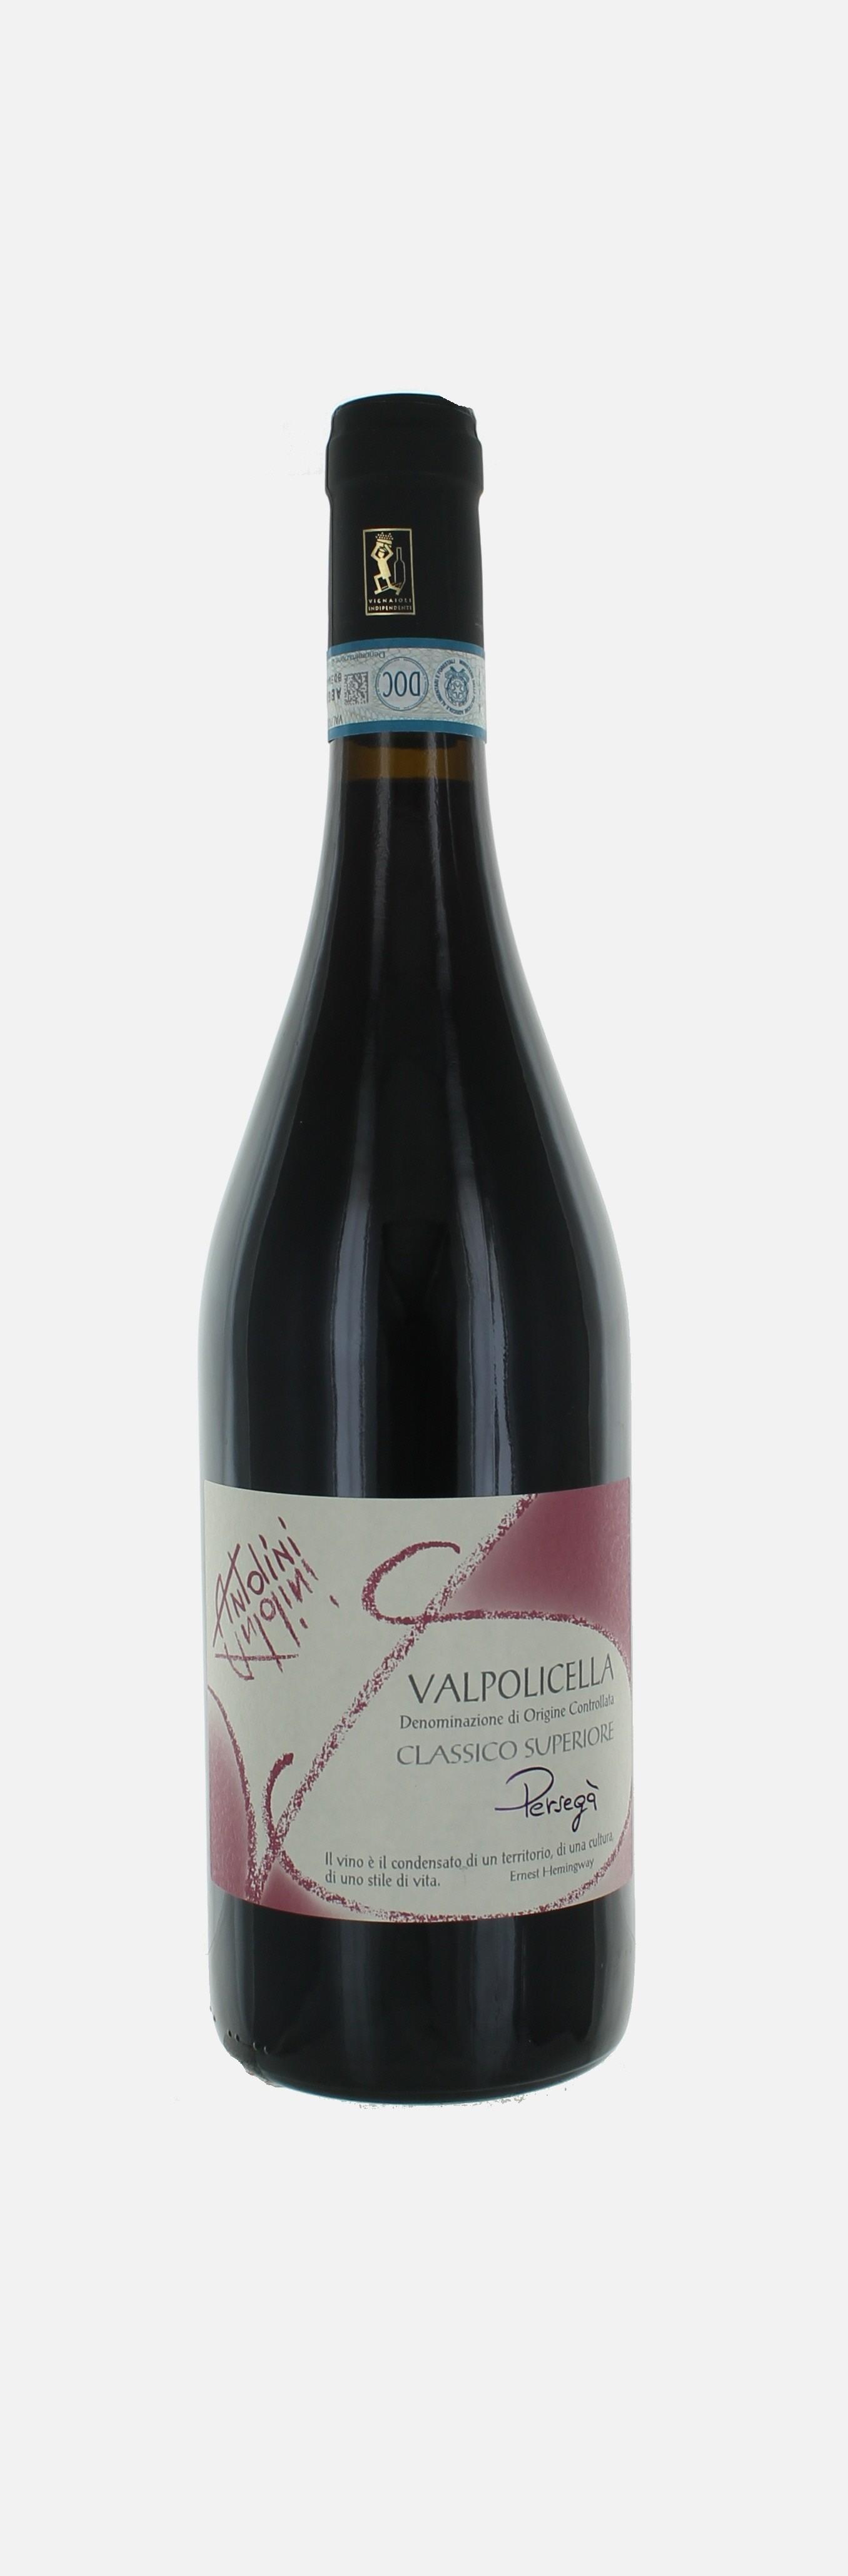 Valpolicella Classico Superiore, Persega, Antolini